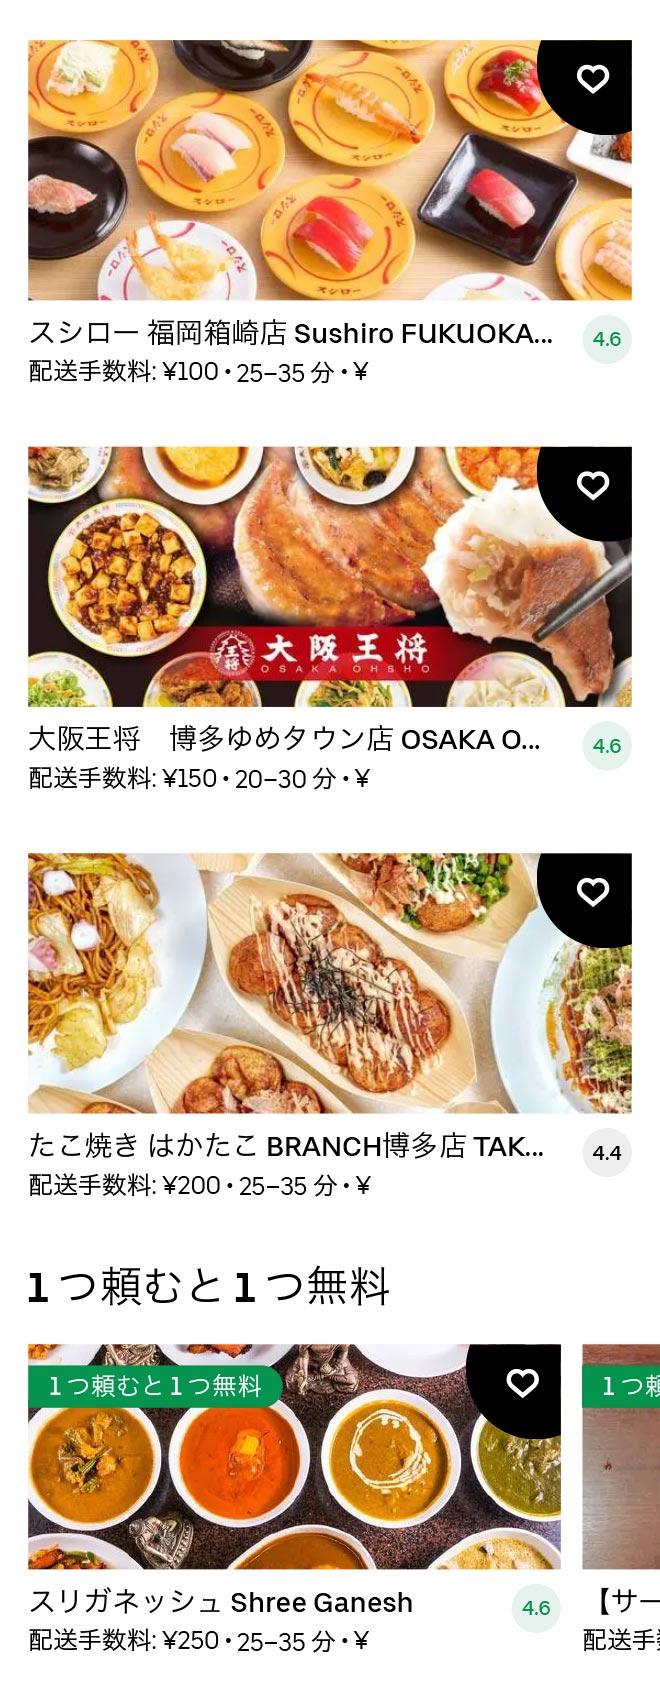 Hakozaki menu 2101 06